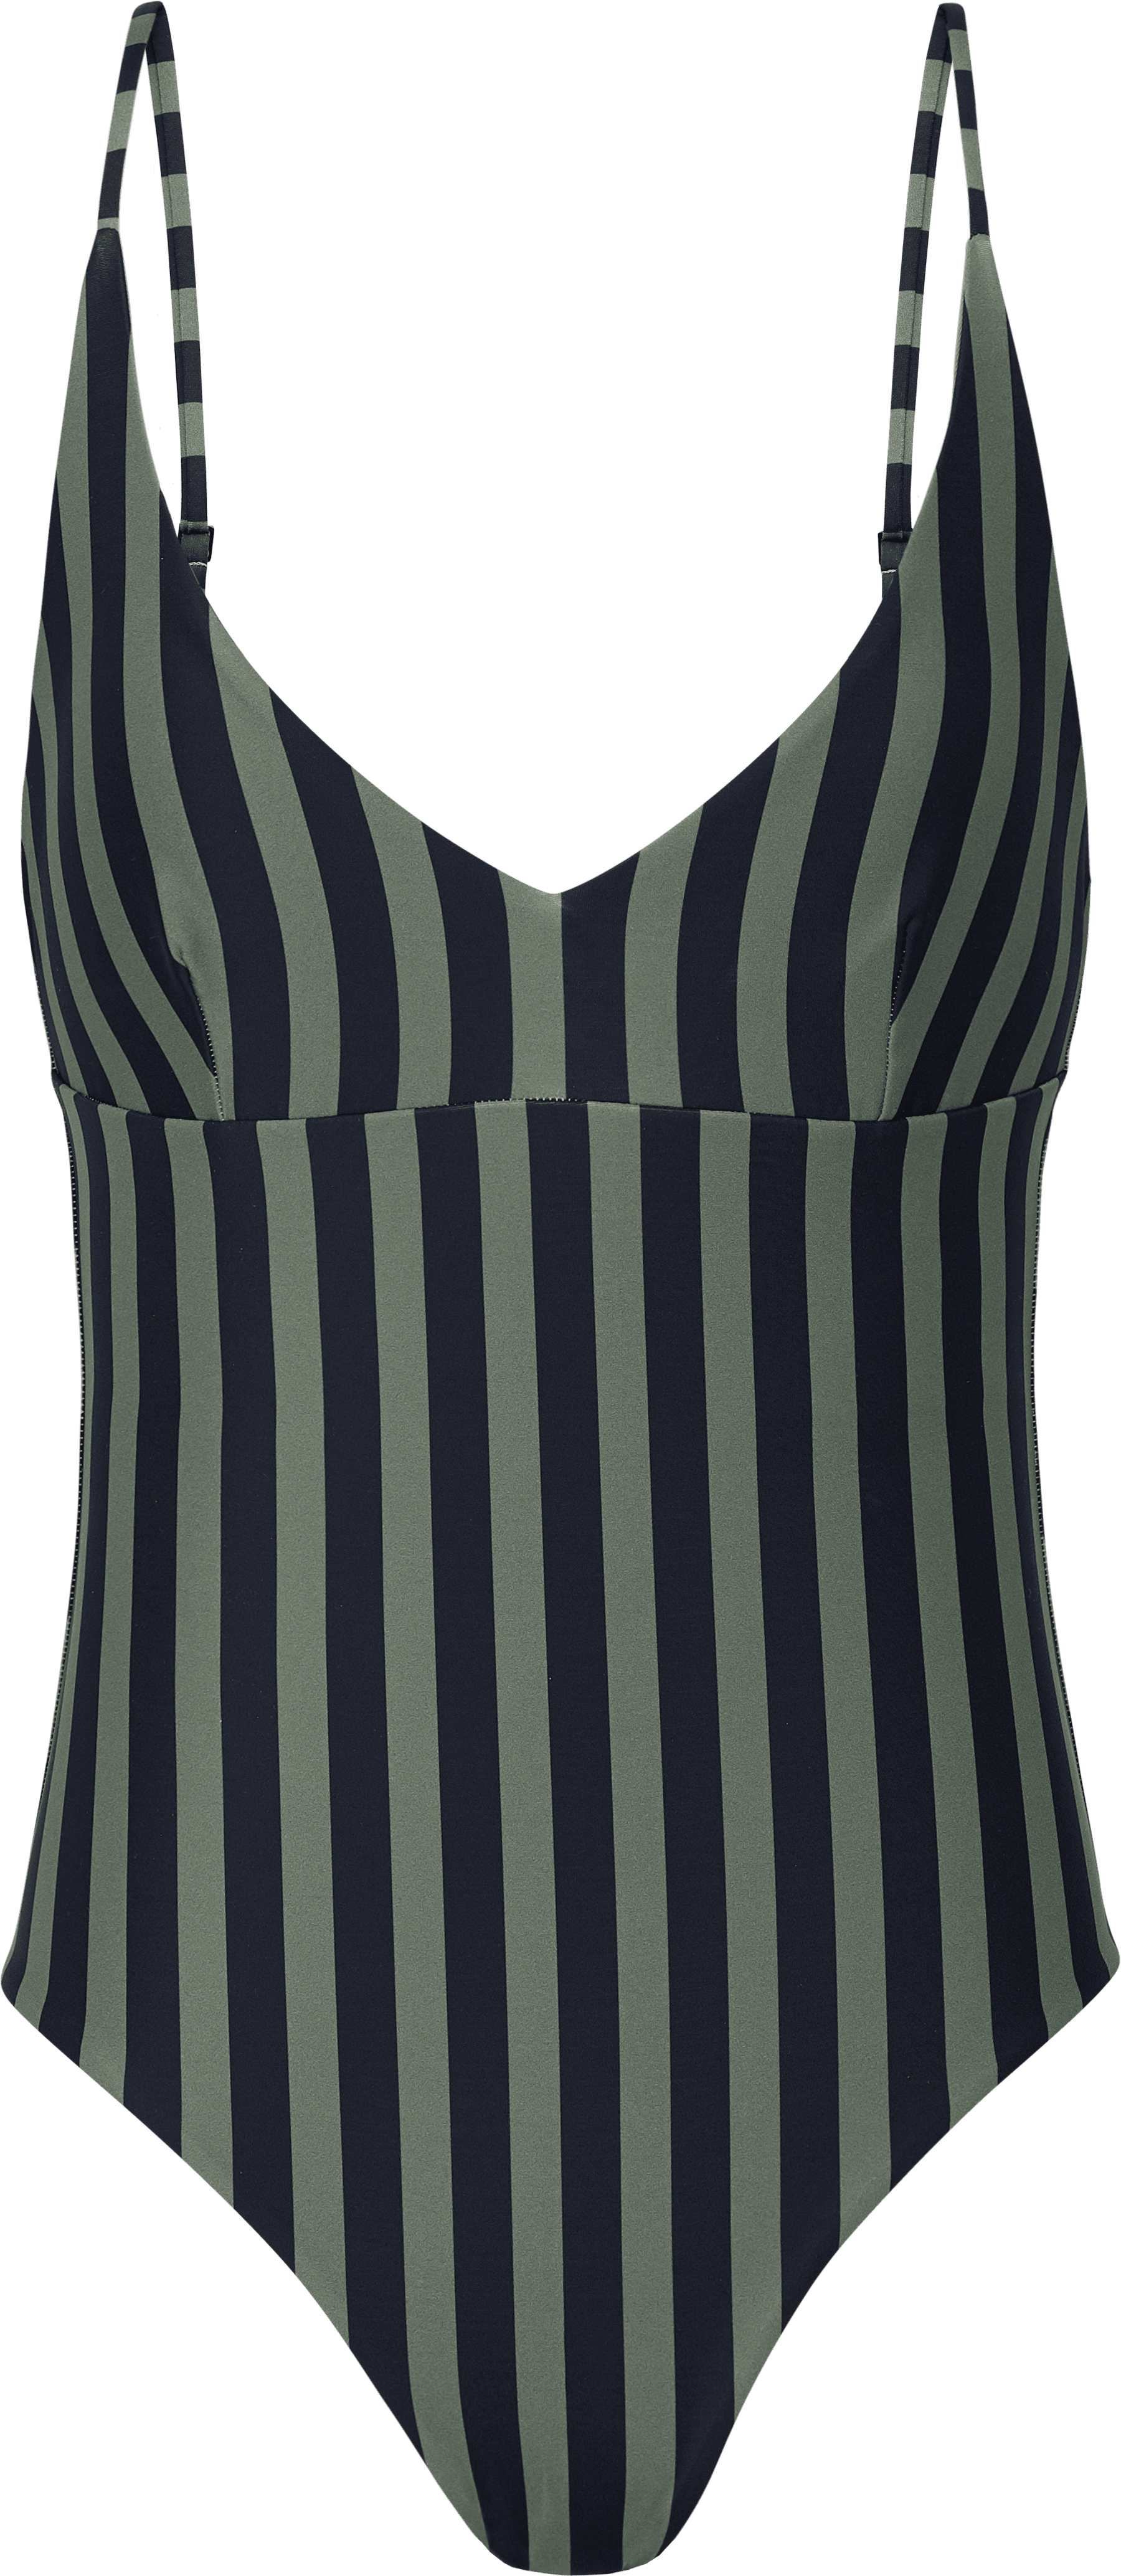 V-neck bathing suit